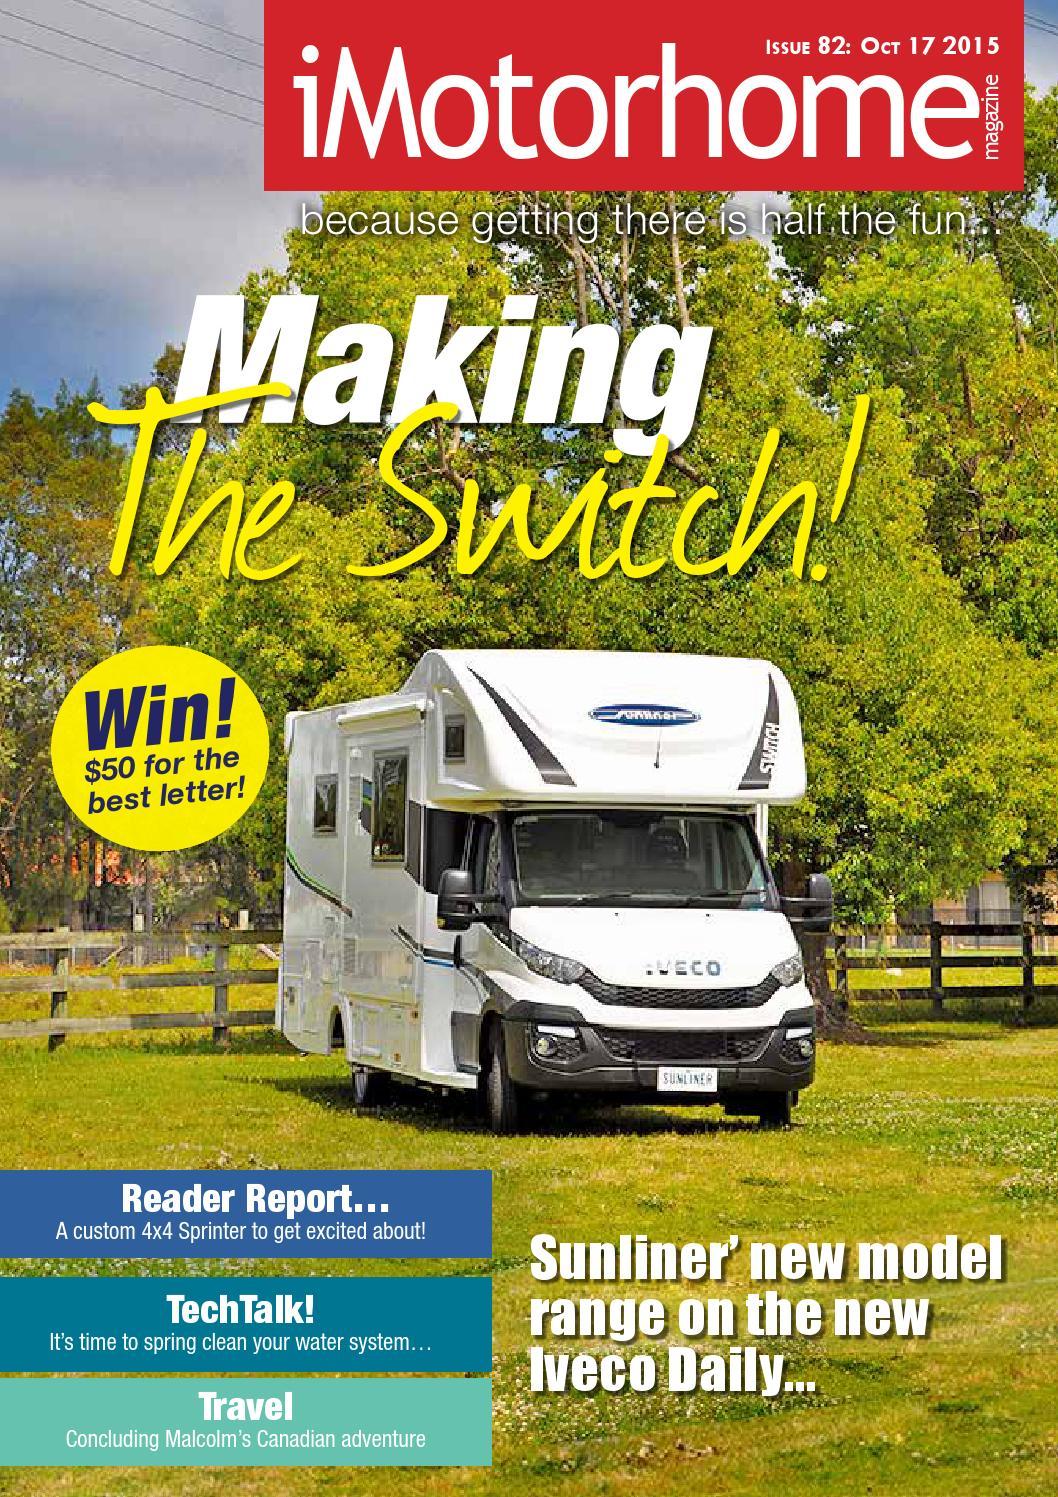 iMotorhome eMagazine Issue 82 - 17 Oct 2015 by iMotorhome Magazine